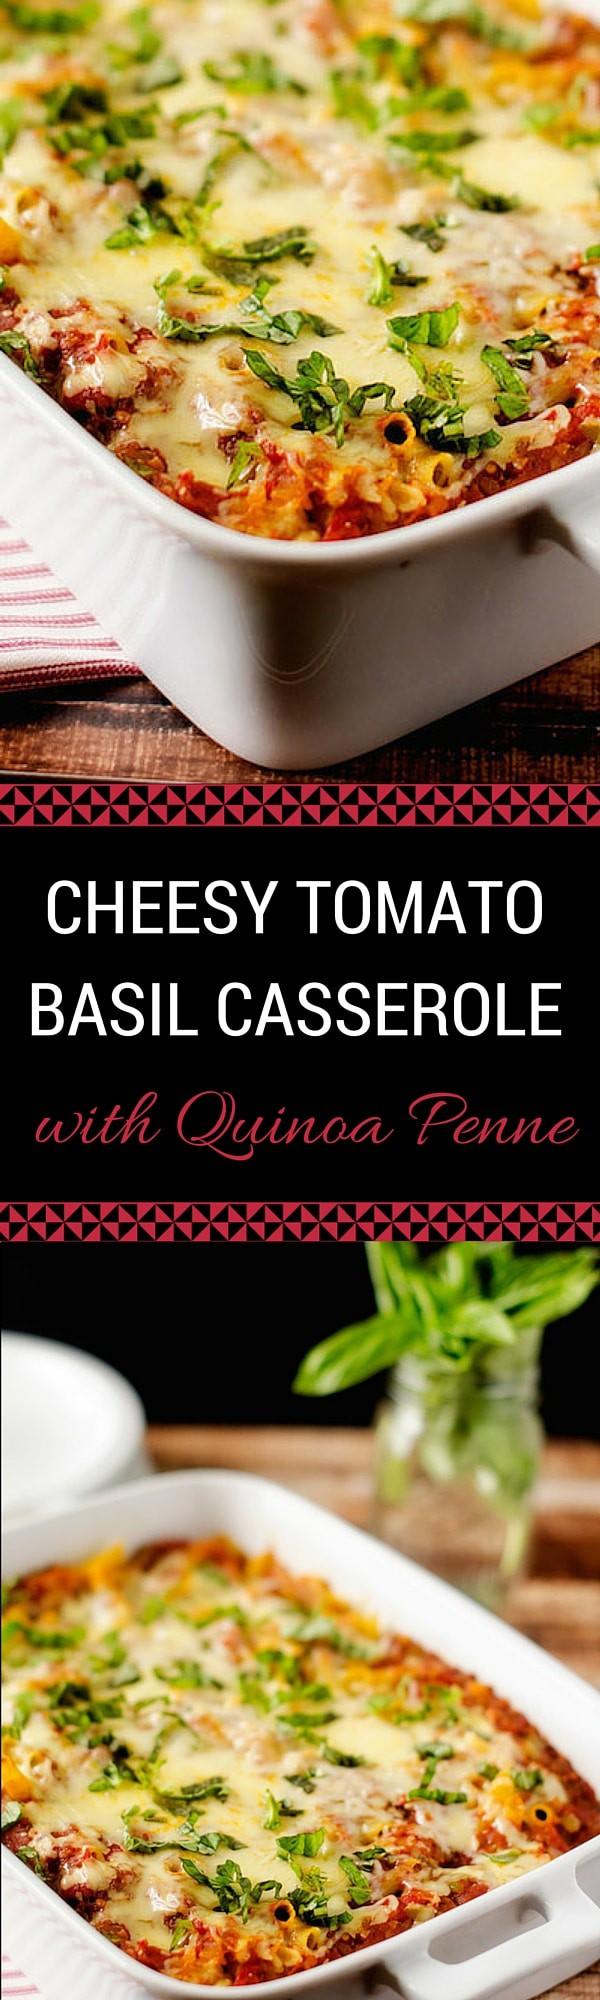 Cheesy Tomato Basil Casserole with Quinoa Penne - WendyPolisi.com